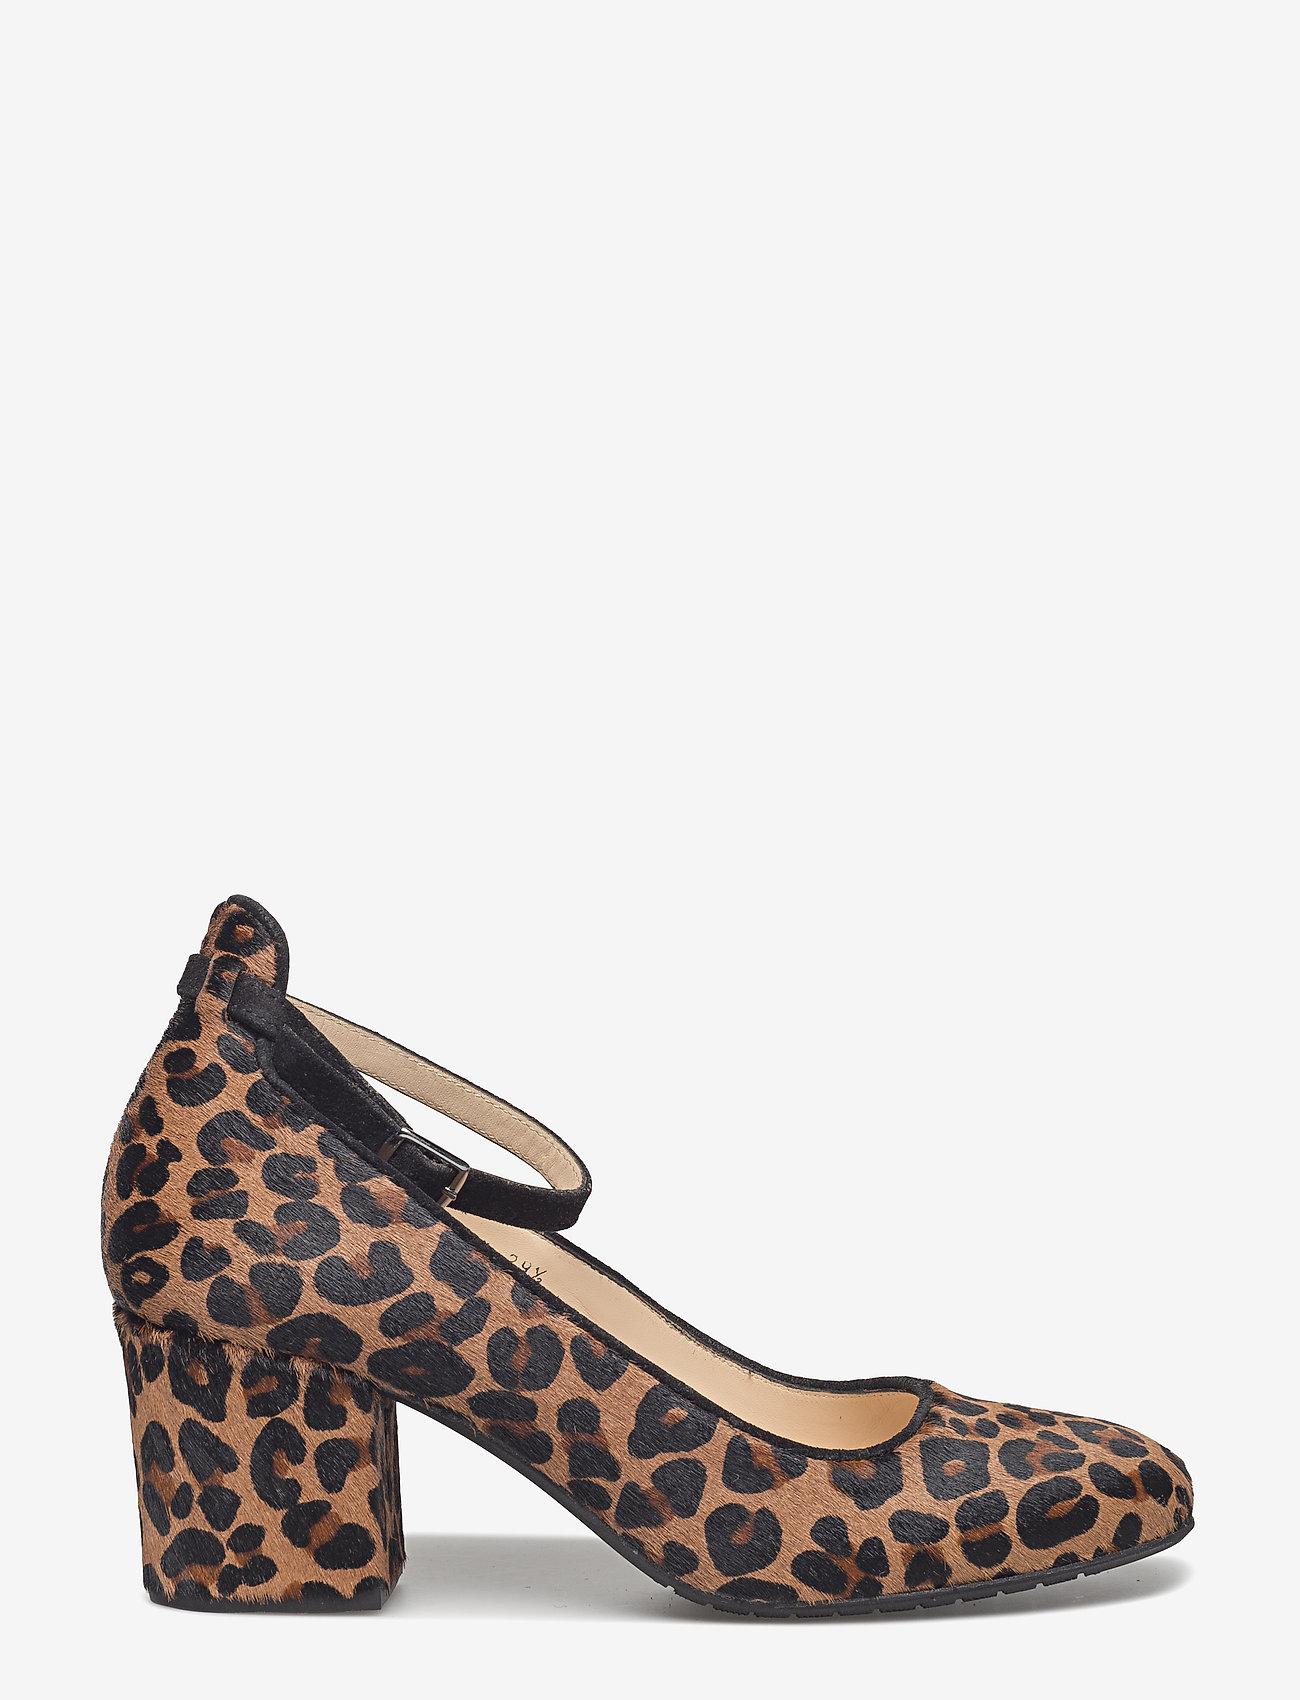 ANGULUS - ***Pump*** - klassiset piikkikorkokengät - 1110/1163 leopard/black - 1